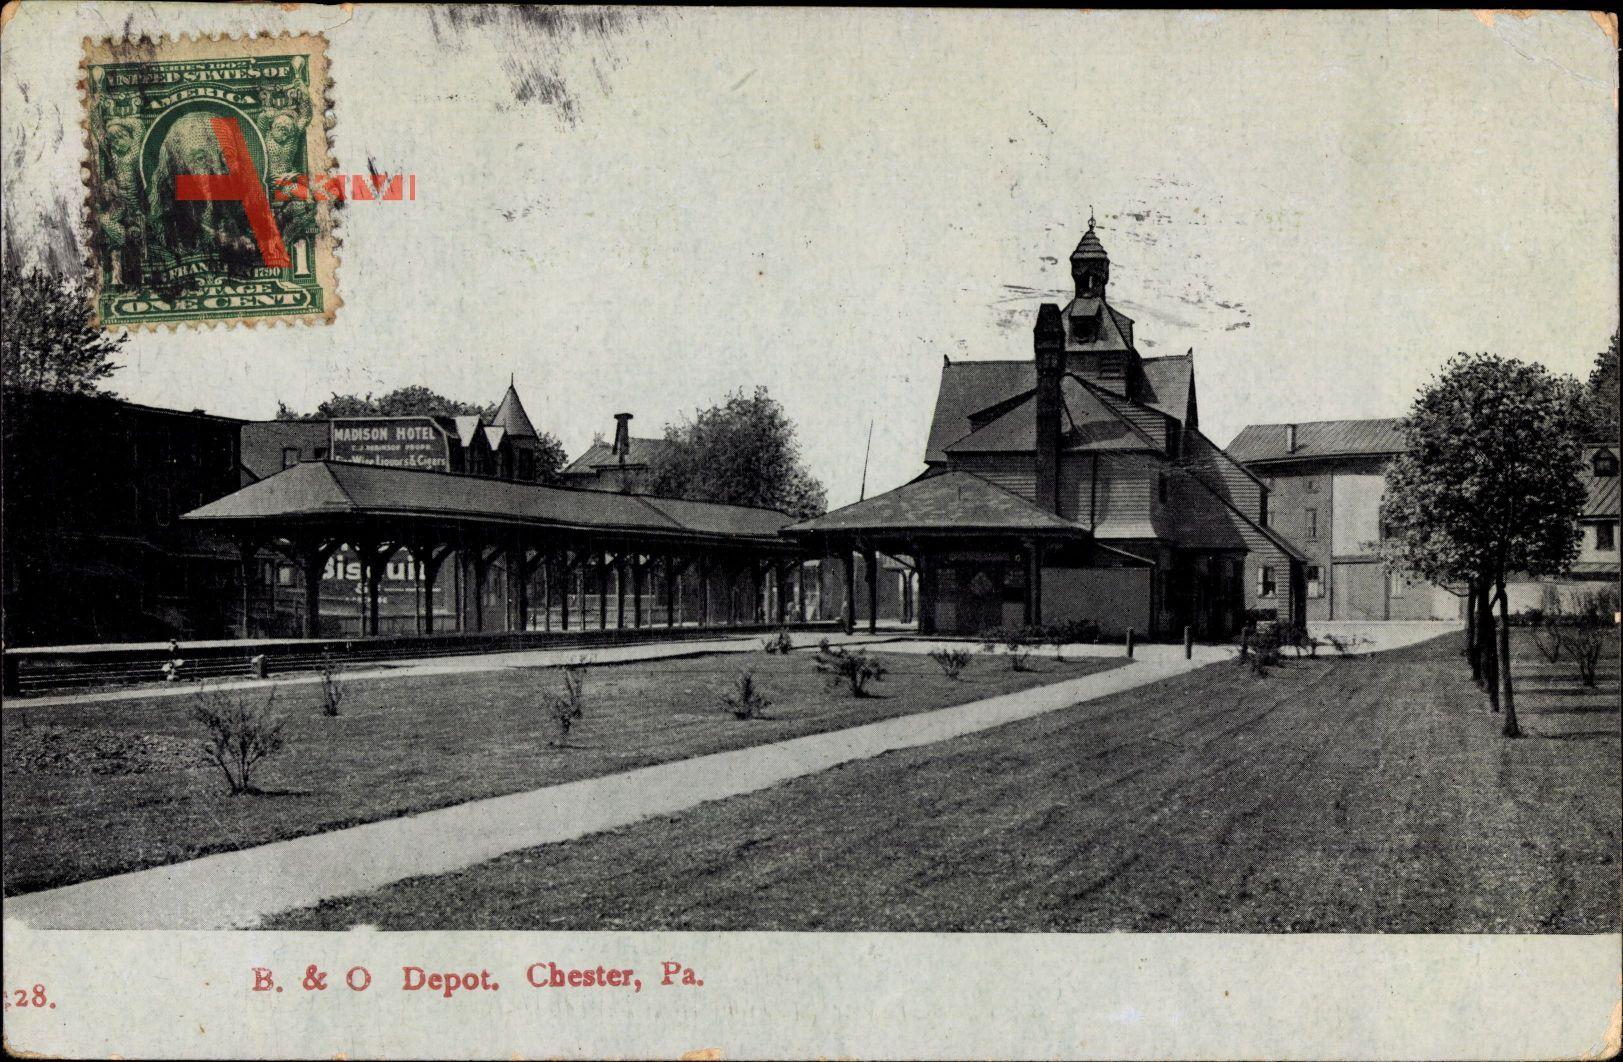 Chester Pennsylvania USA, BO Depot, Bahnhof, Railway Station